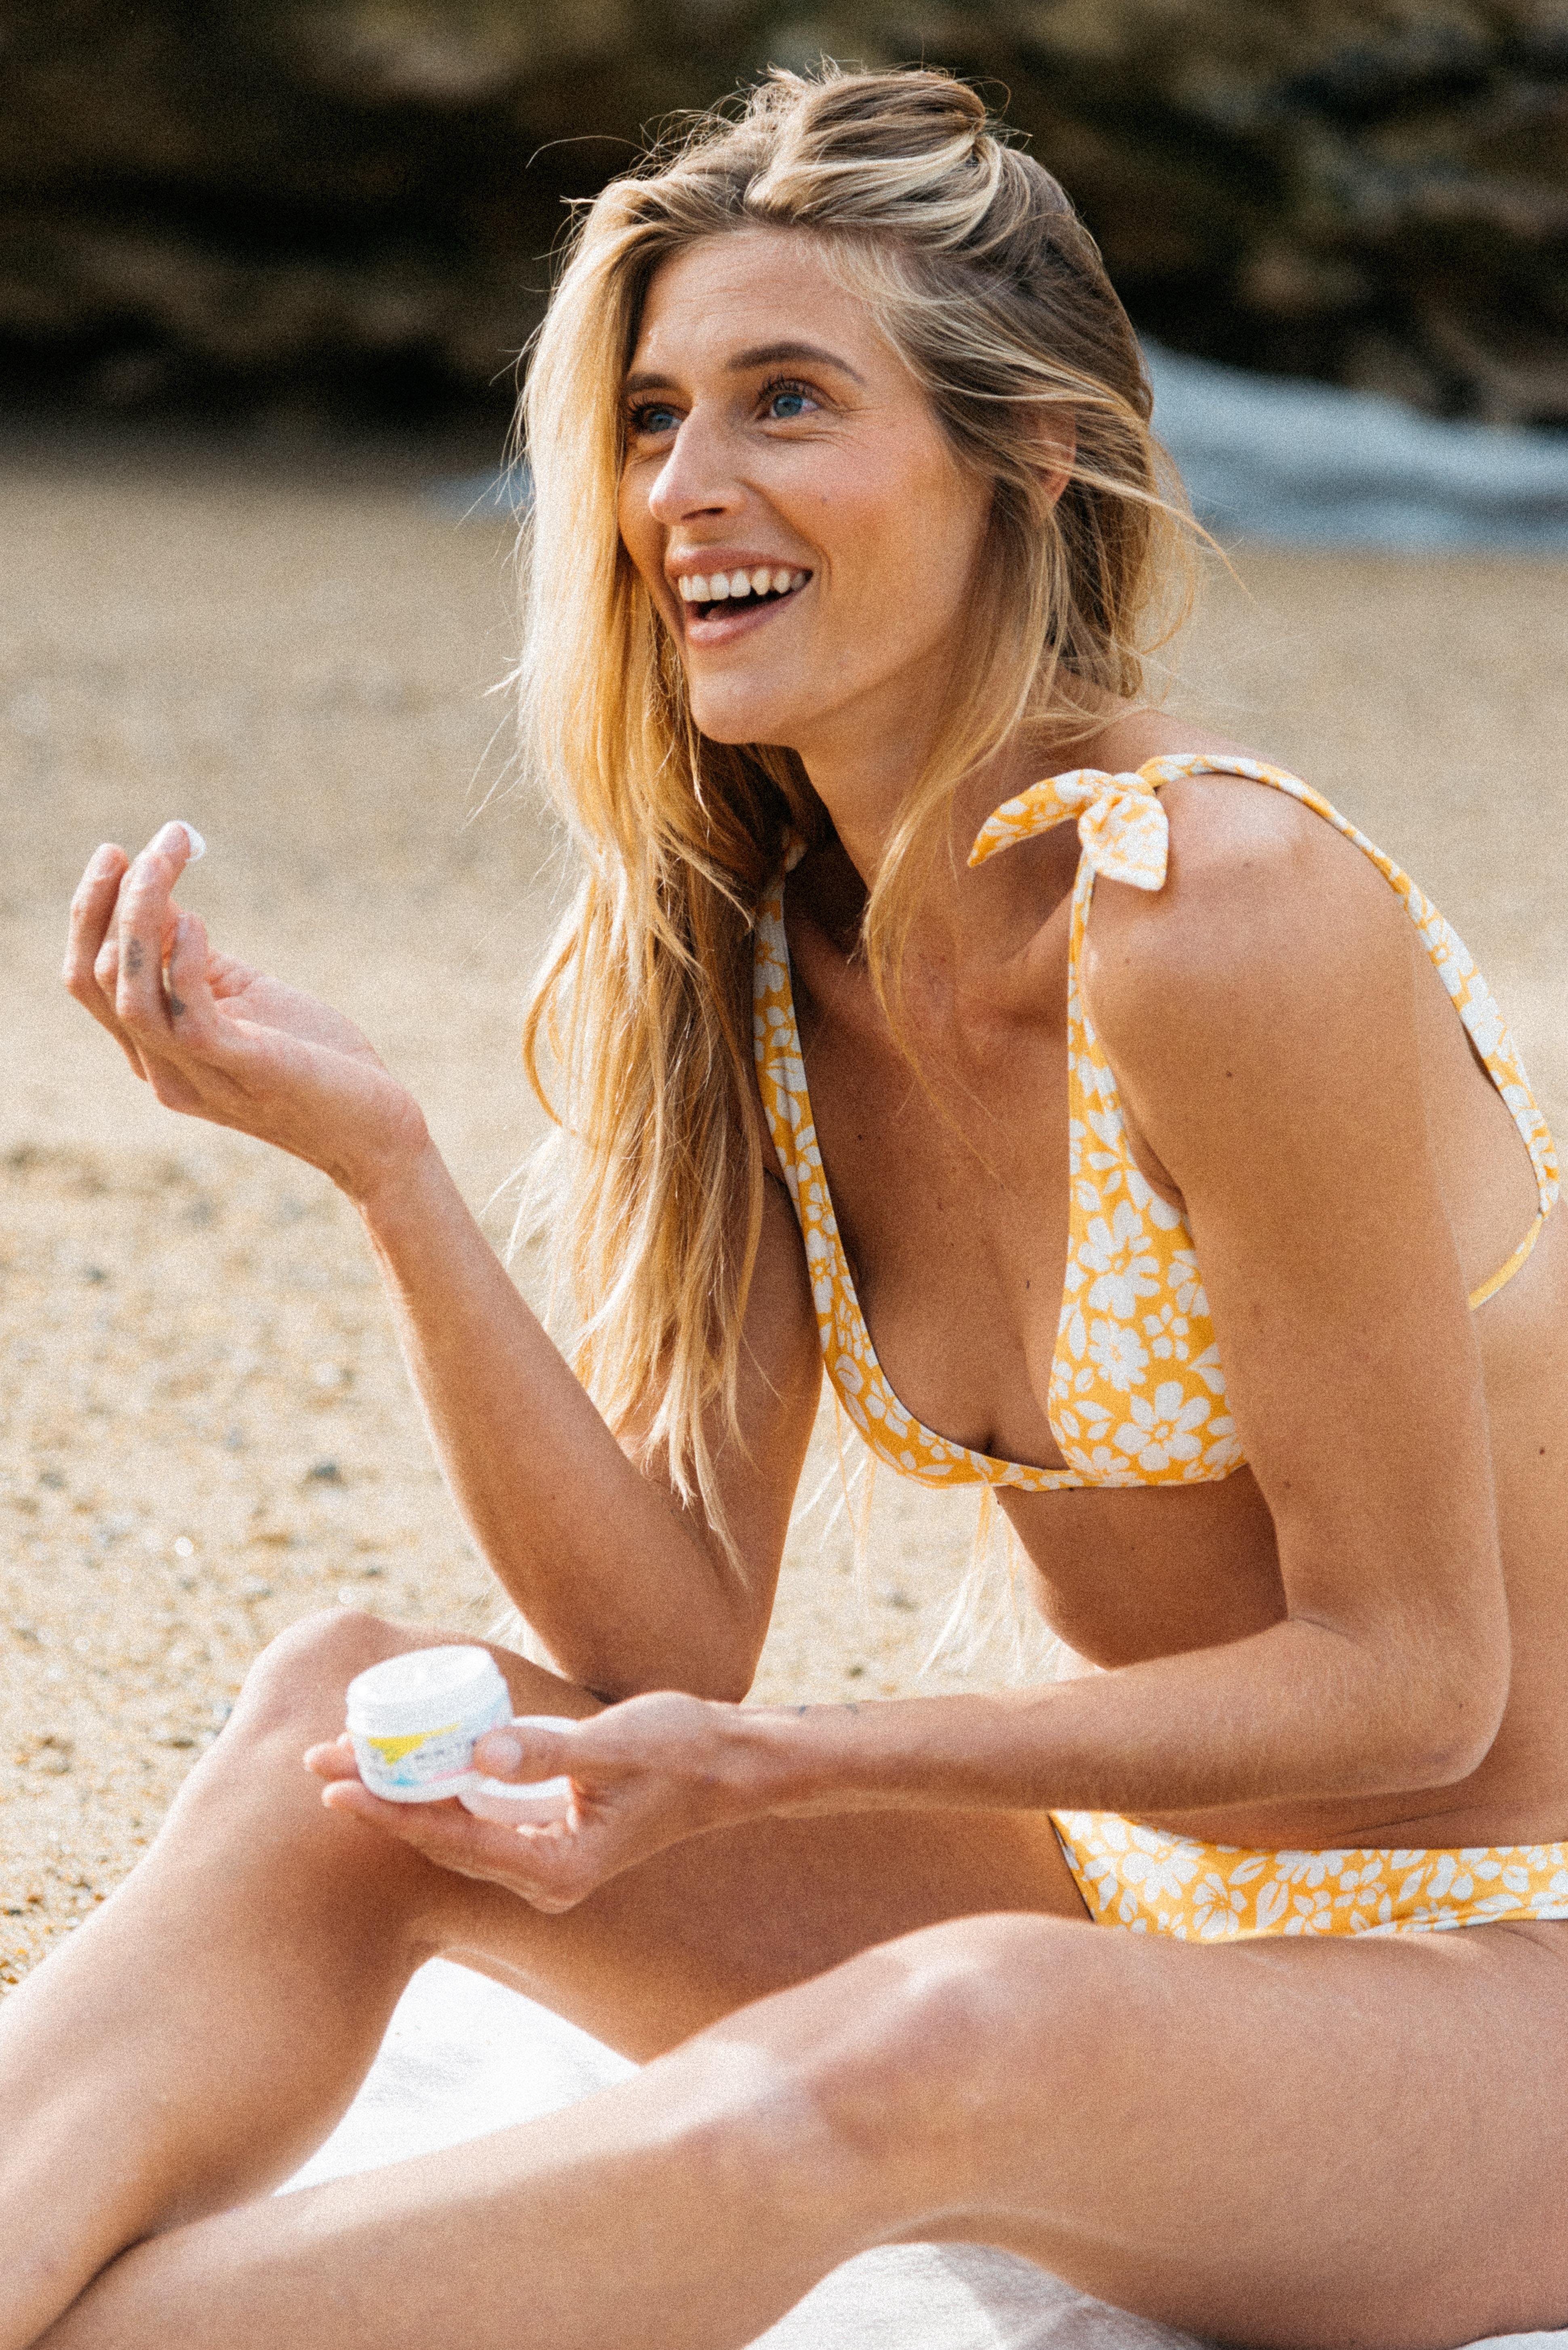 Bikini Sur le sable flower yellow print